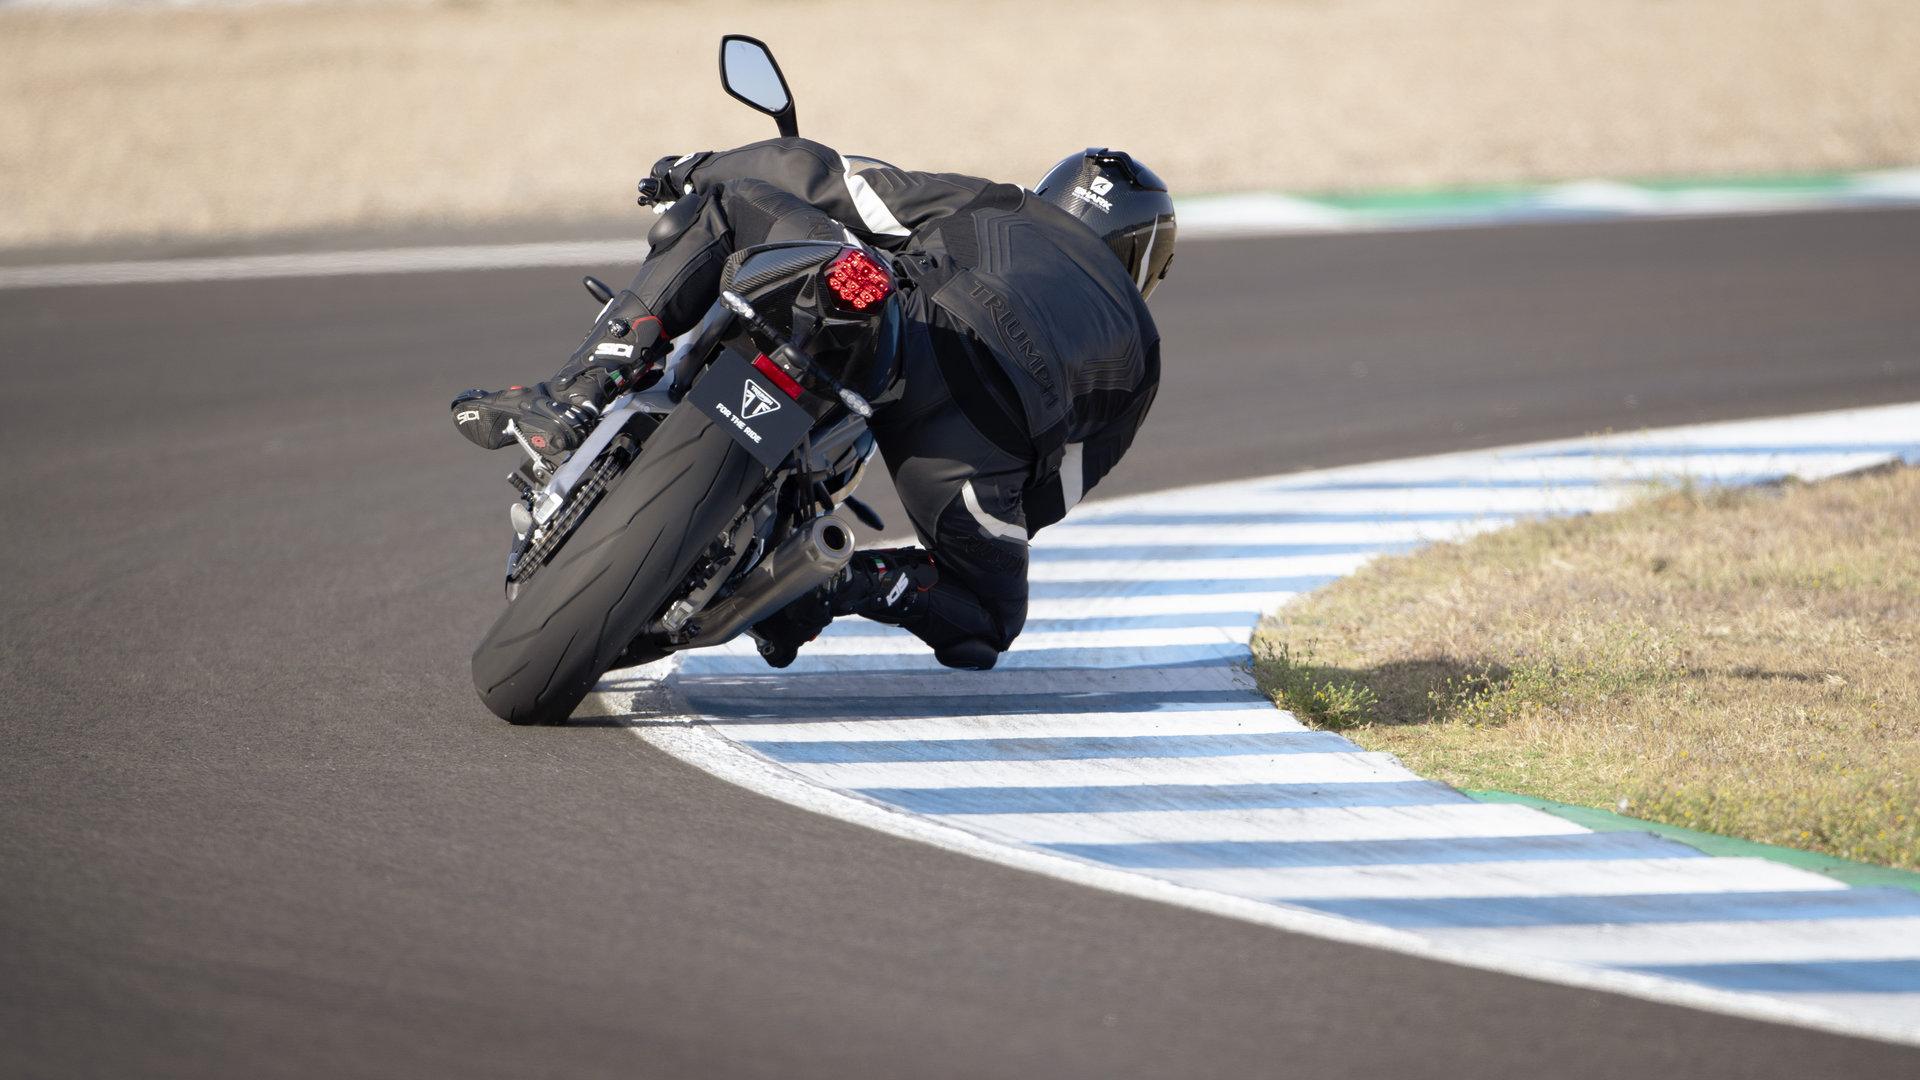 Triumph Daytona Moto2 765 10